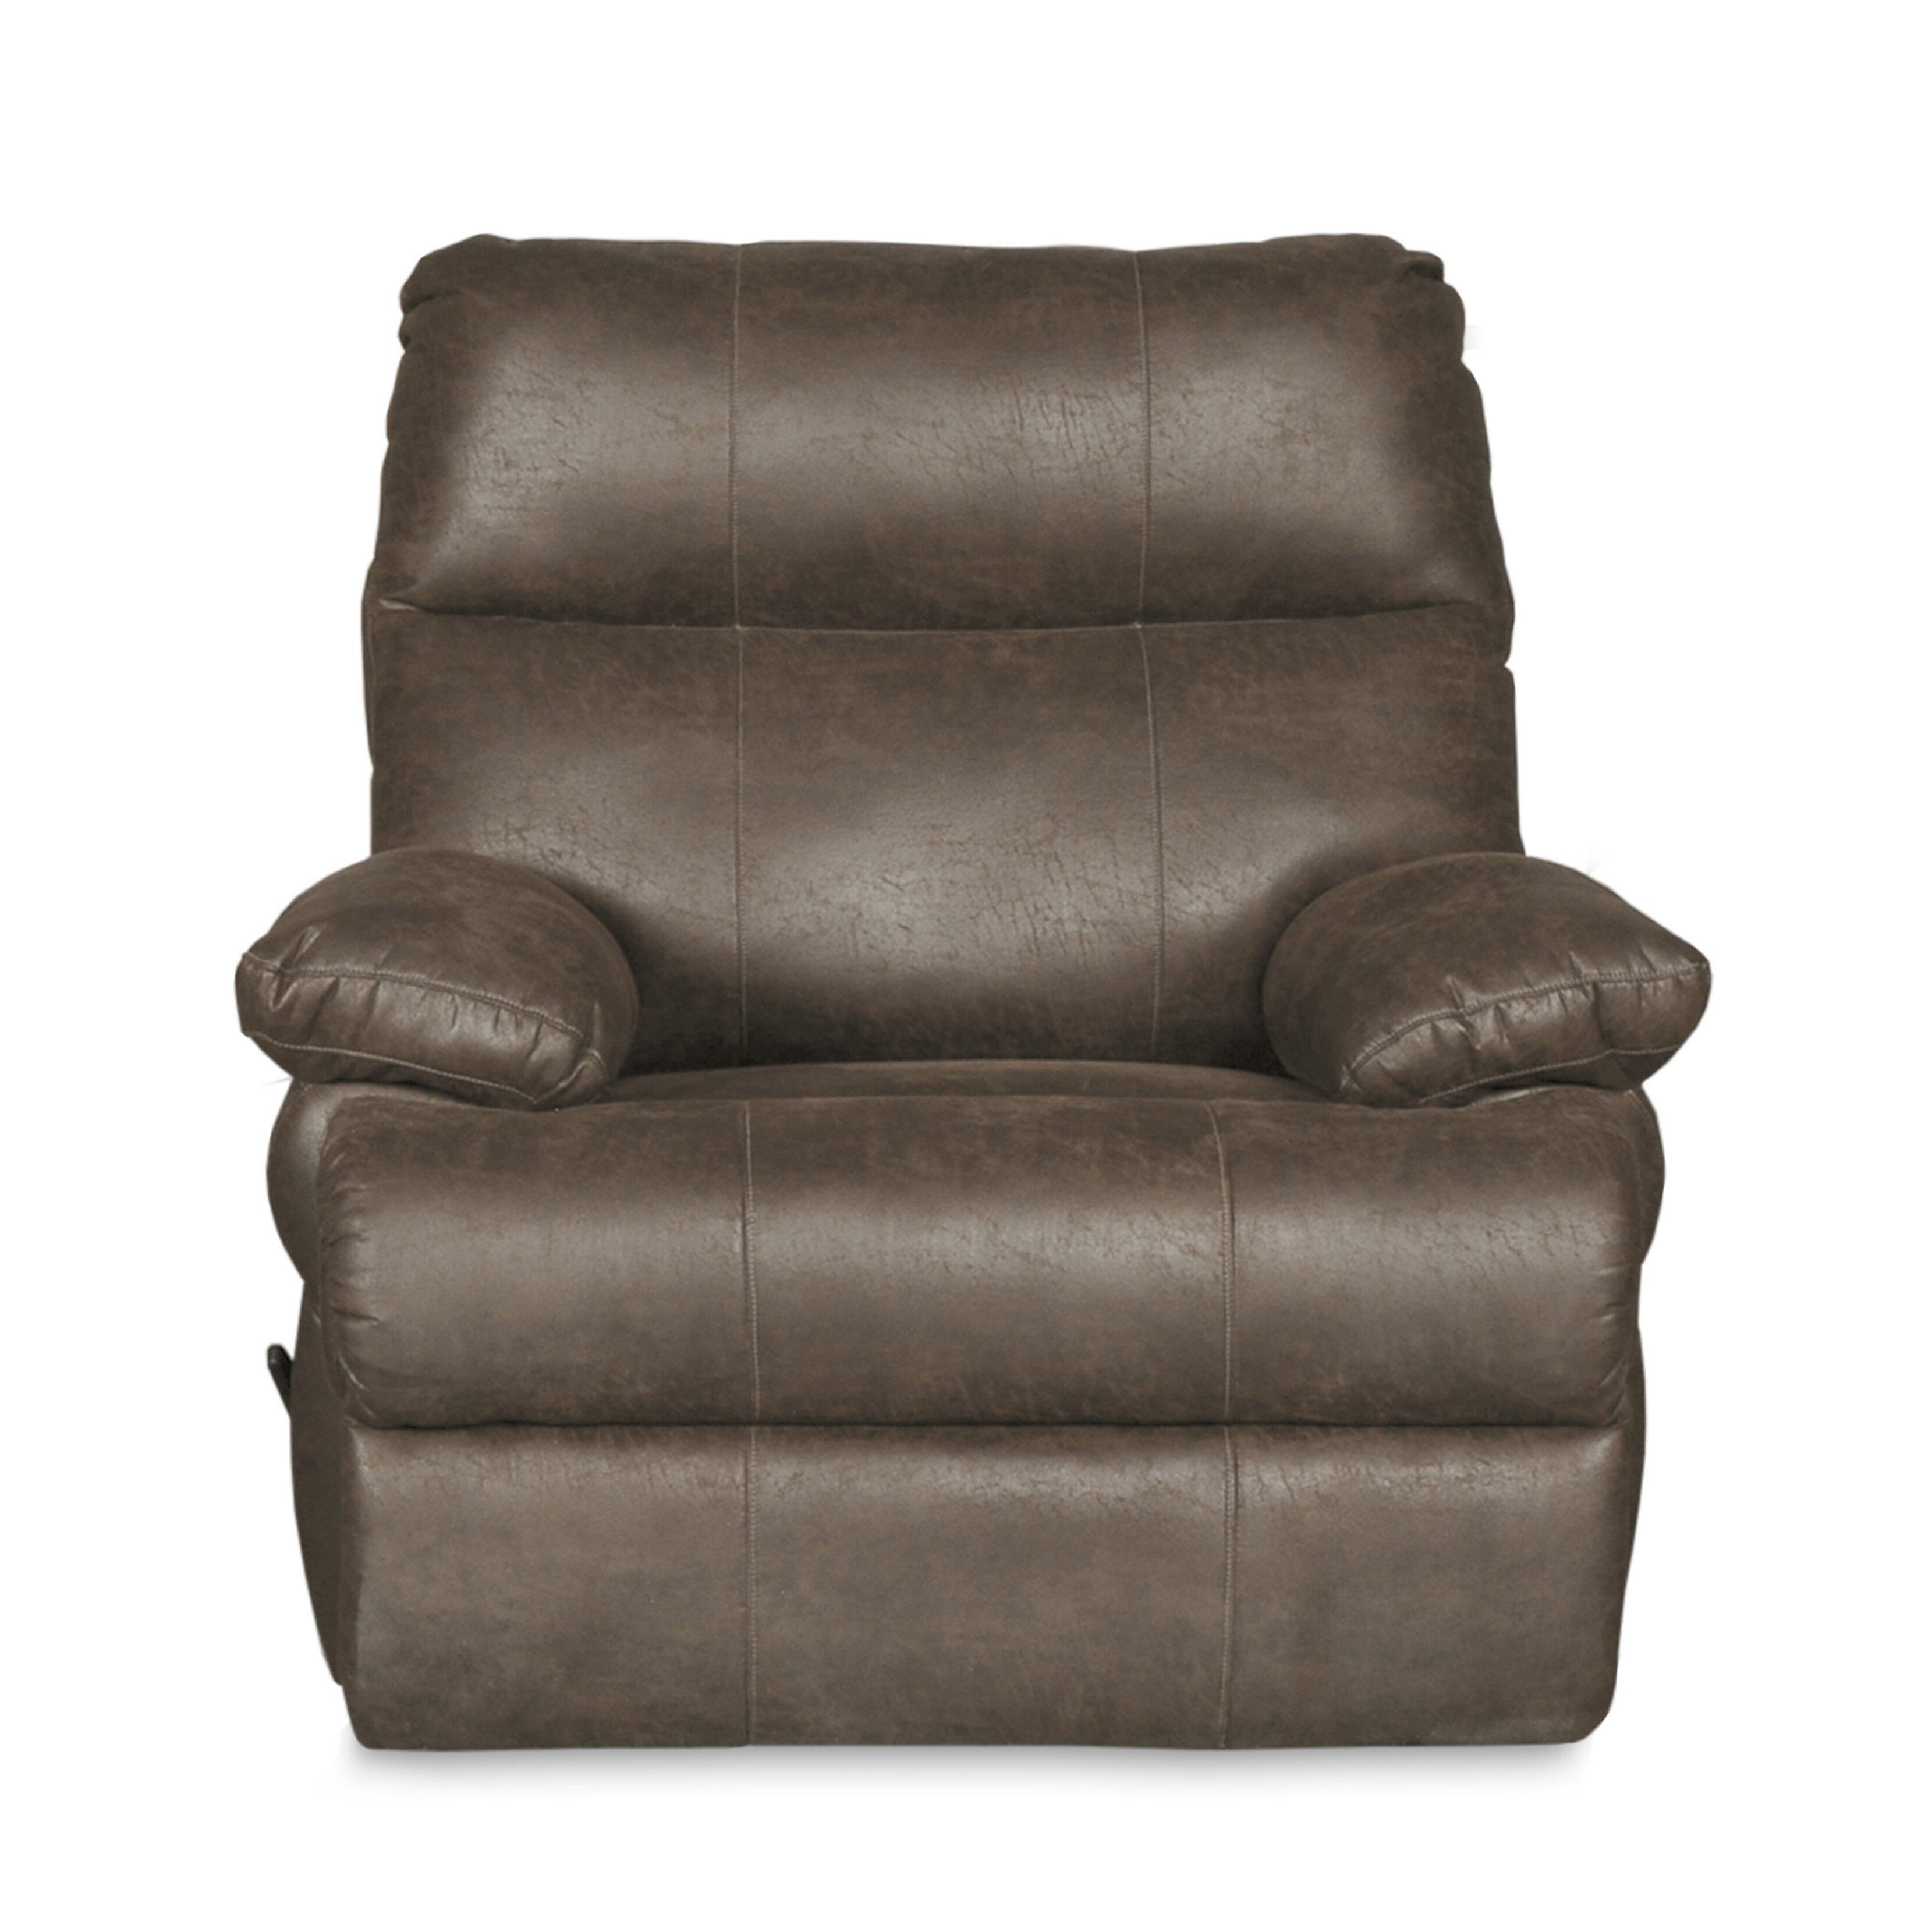 Revoluxion Furniture Co. Riley Oversized Rocker Swivel ...